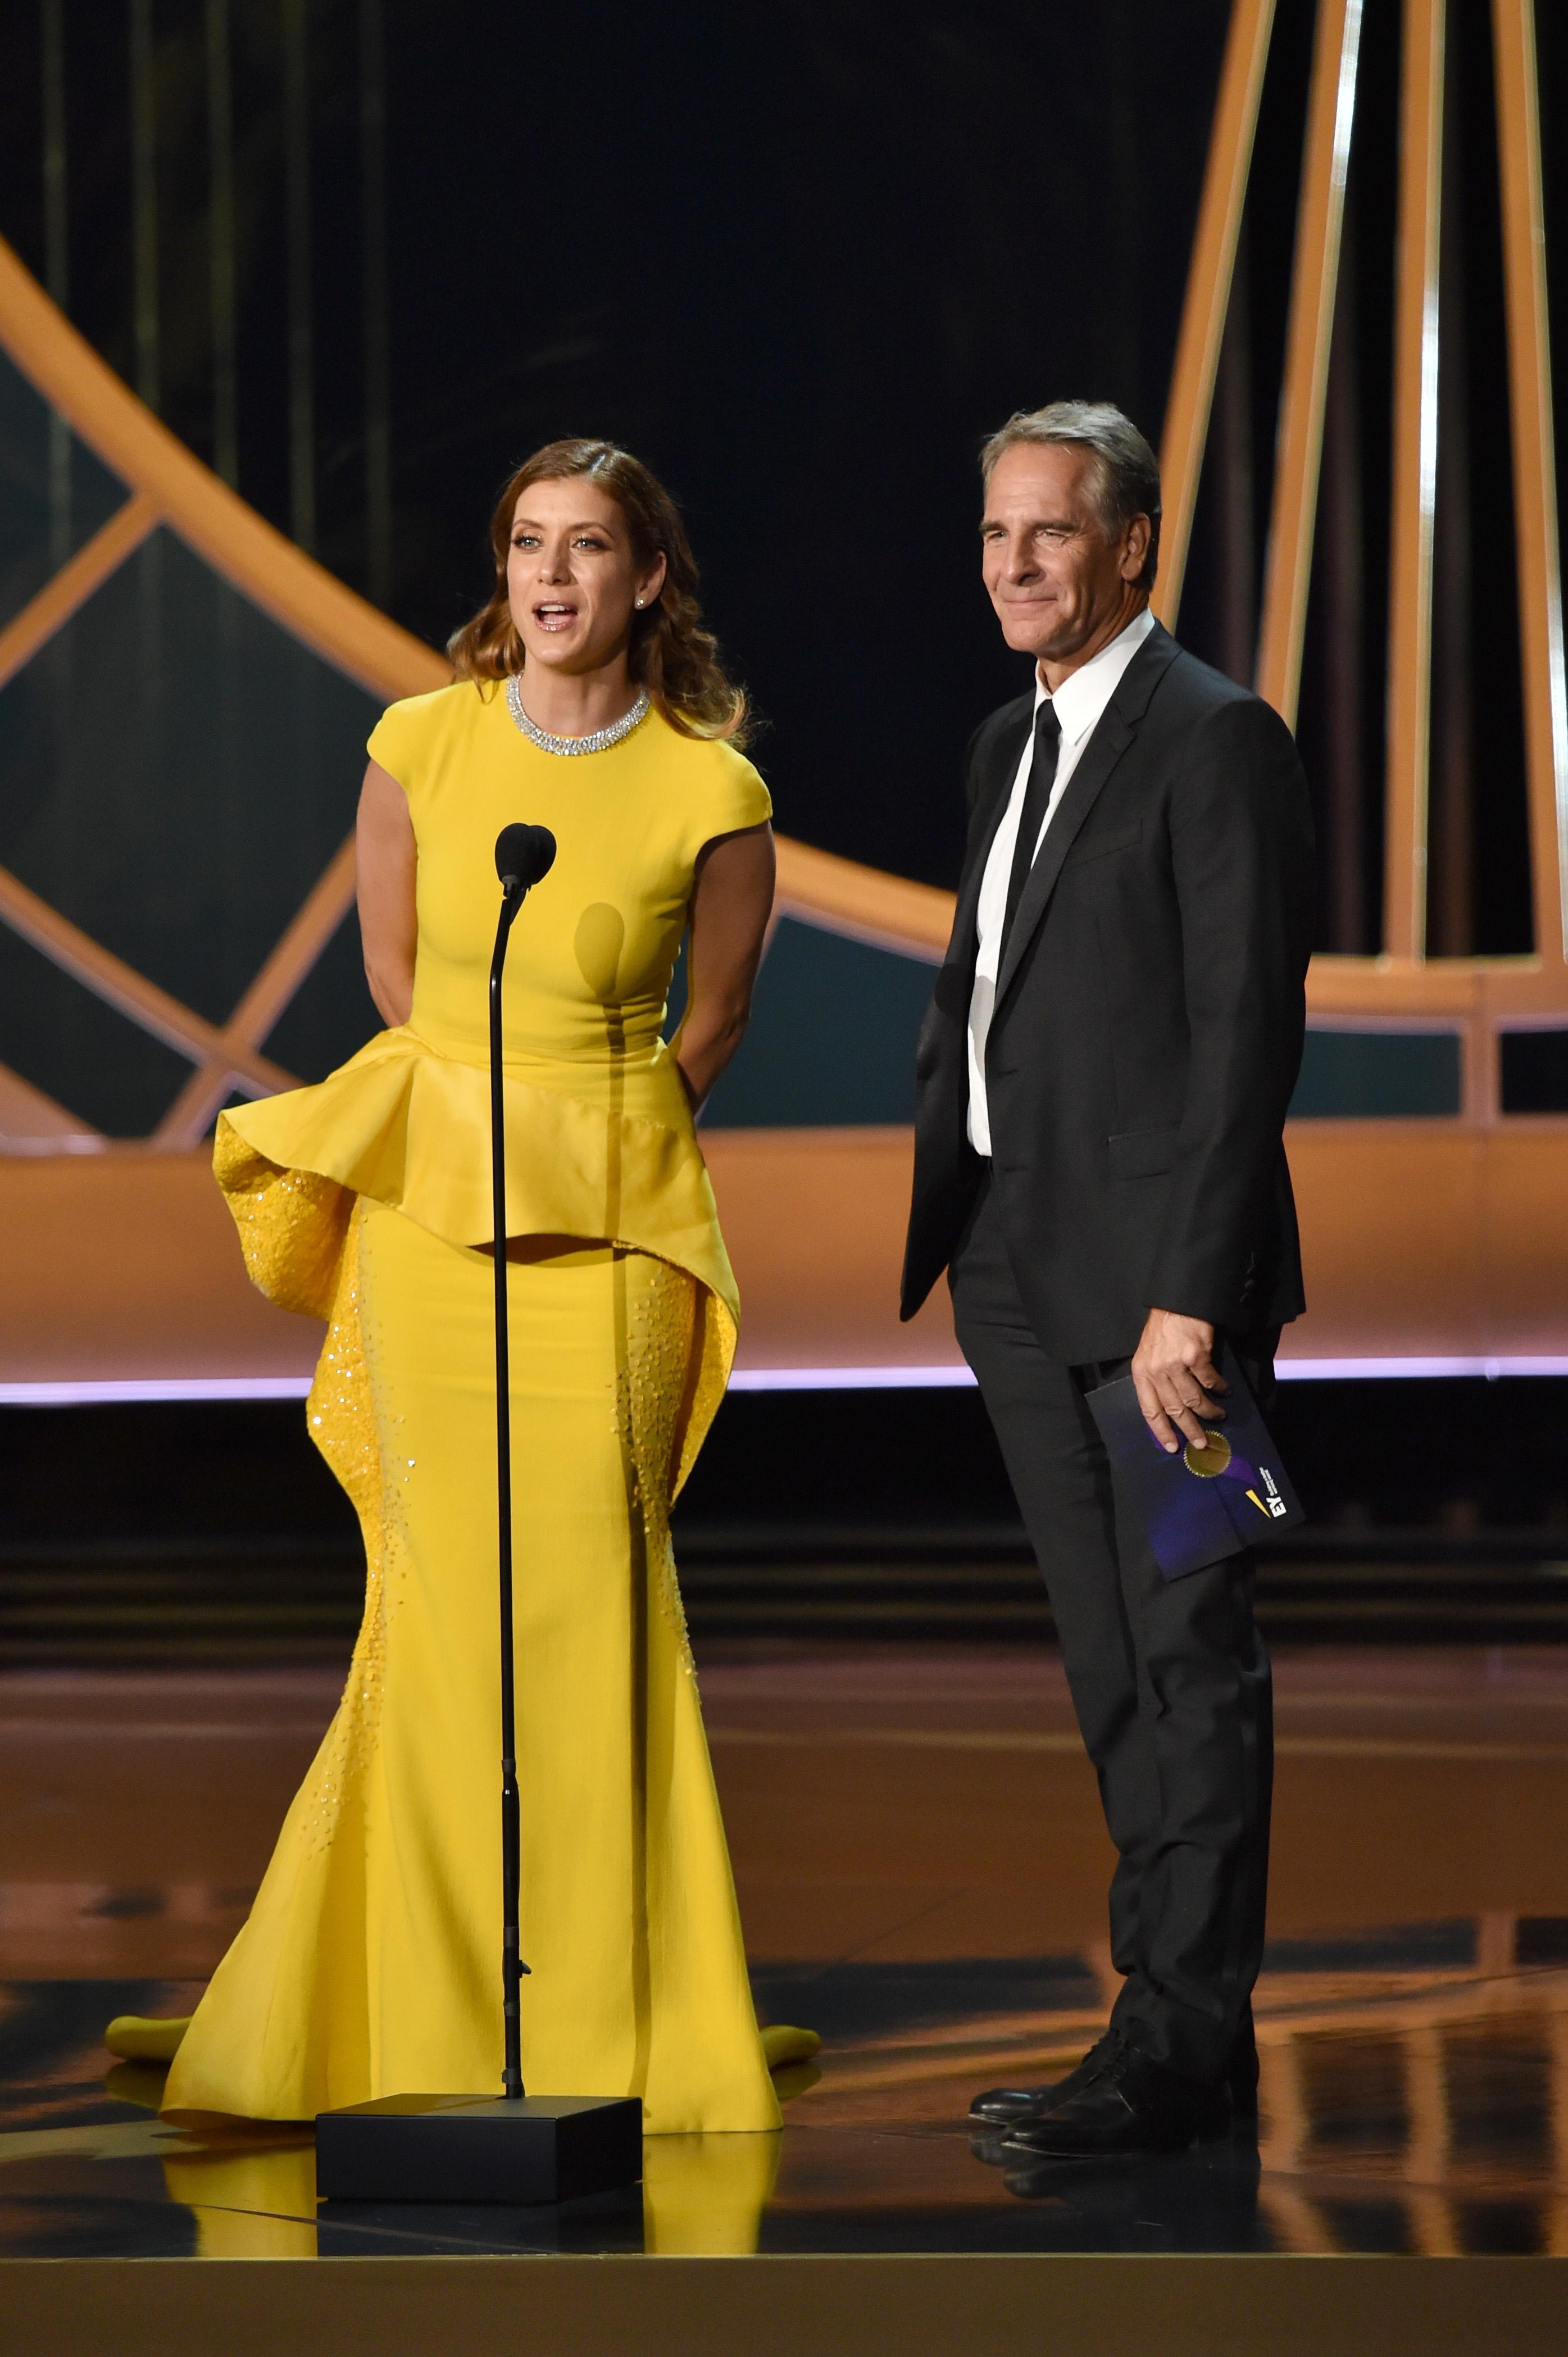 66th Annual Primetime Emmy Awards - Show